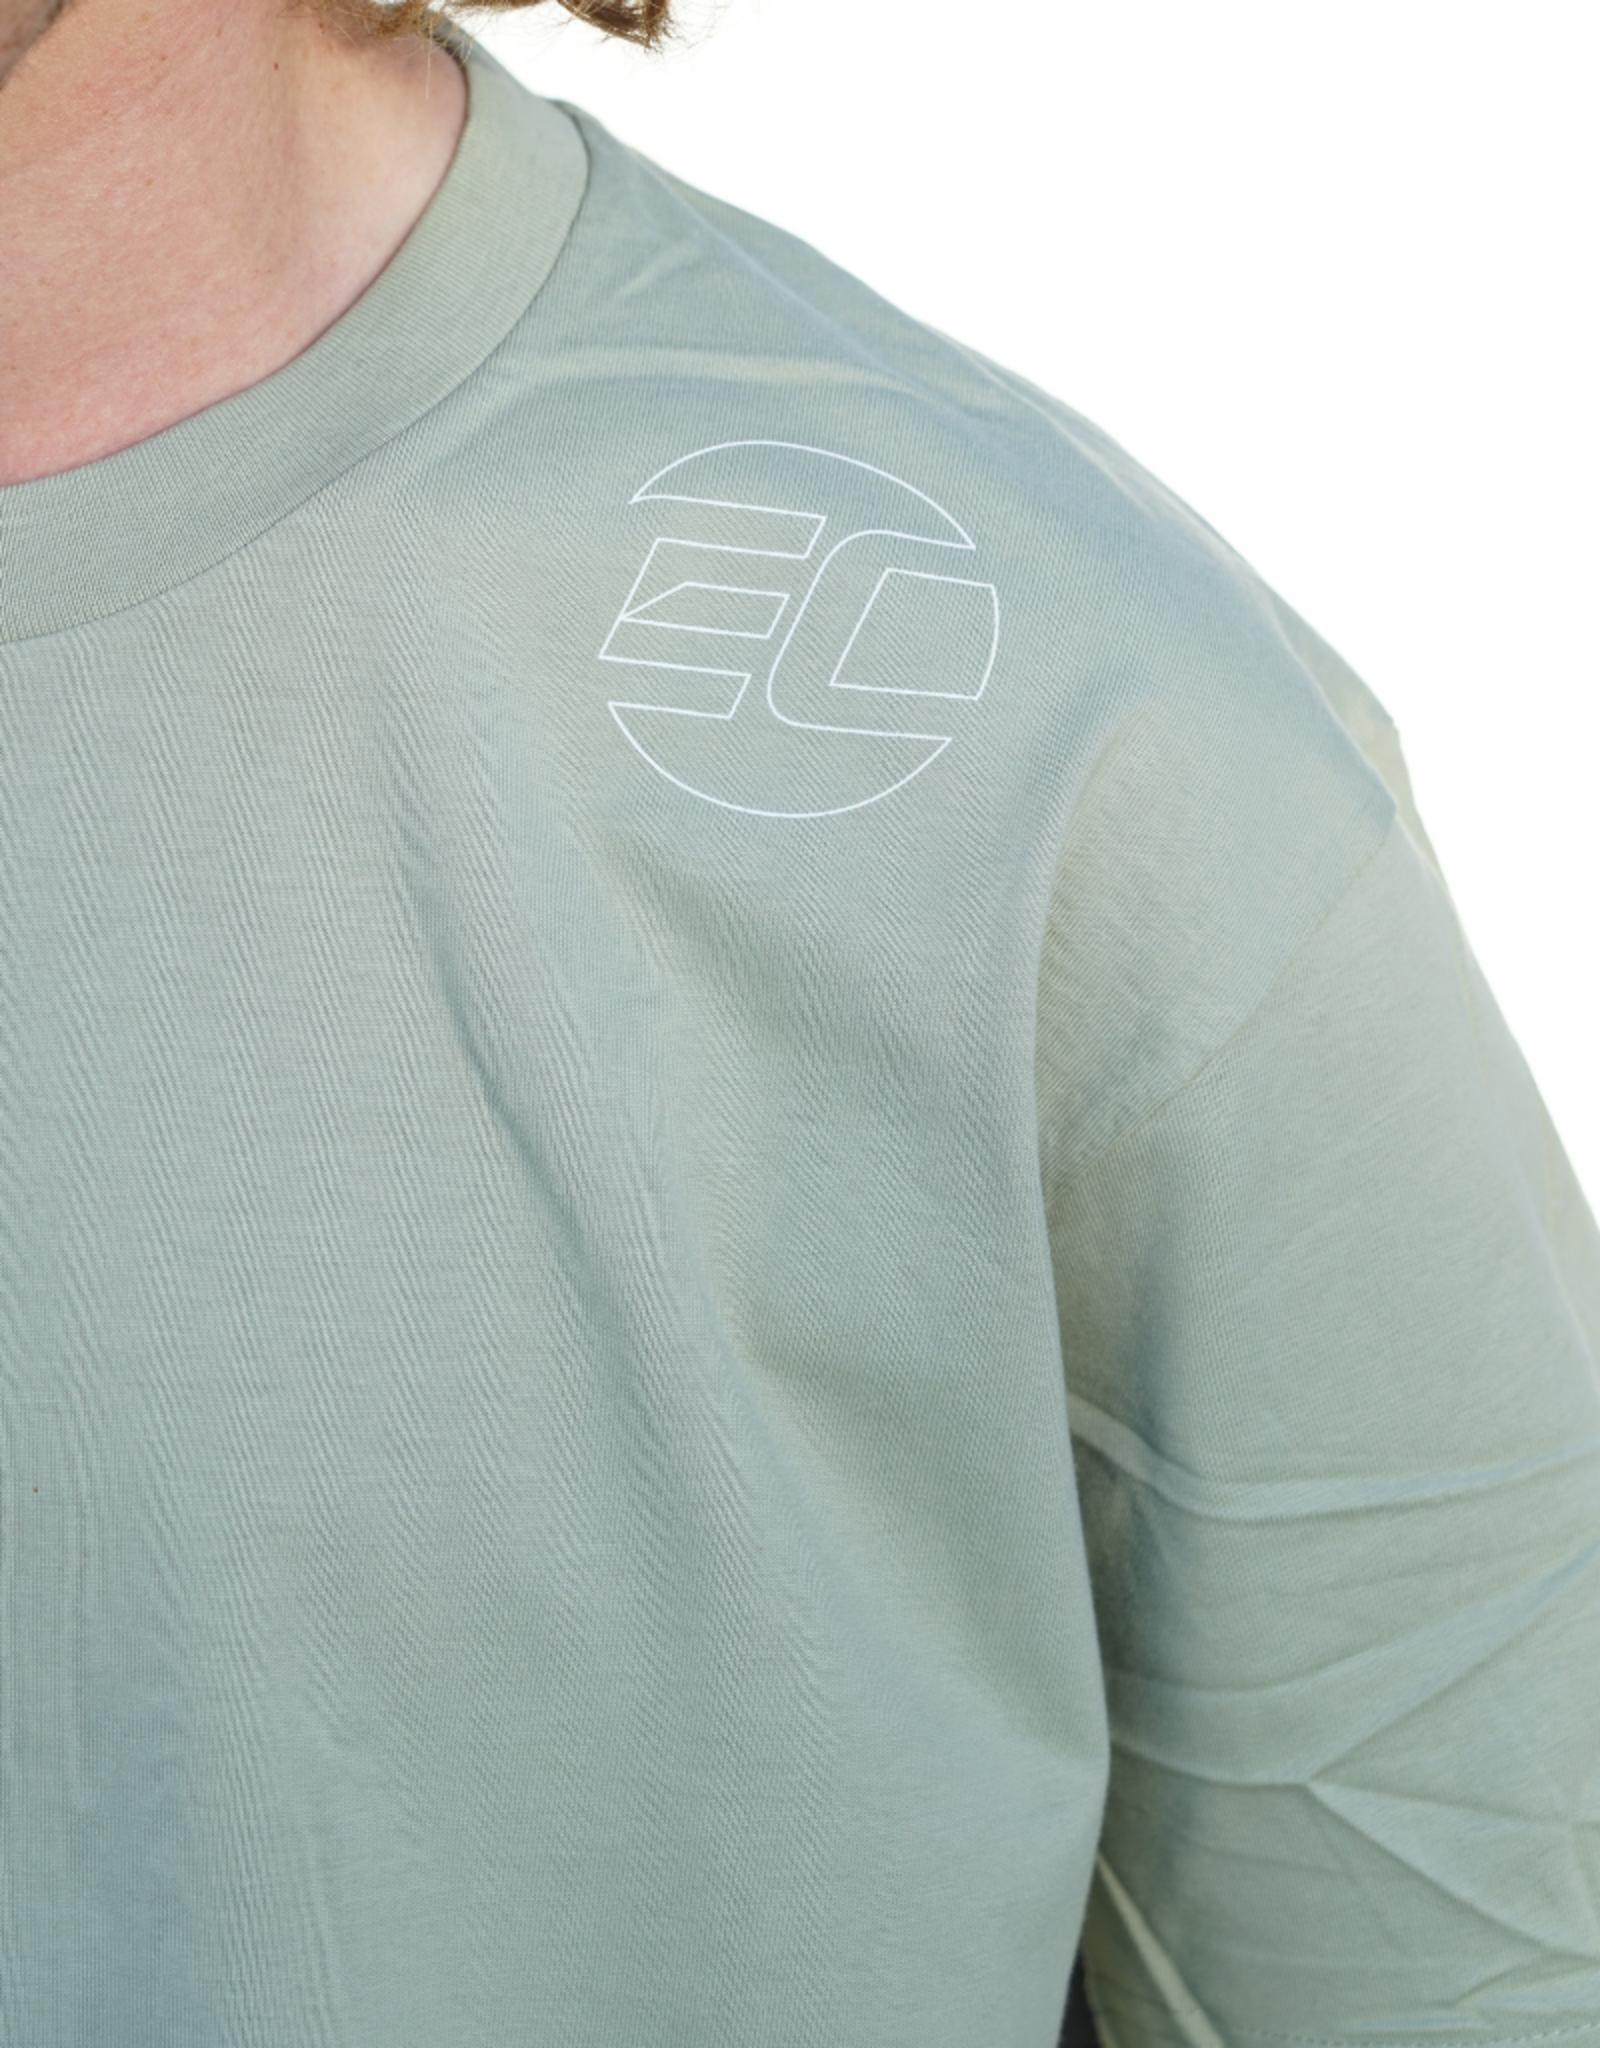 Empire Cycles Empire Little Stencil Shirt